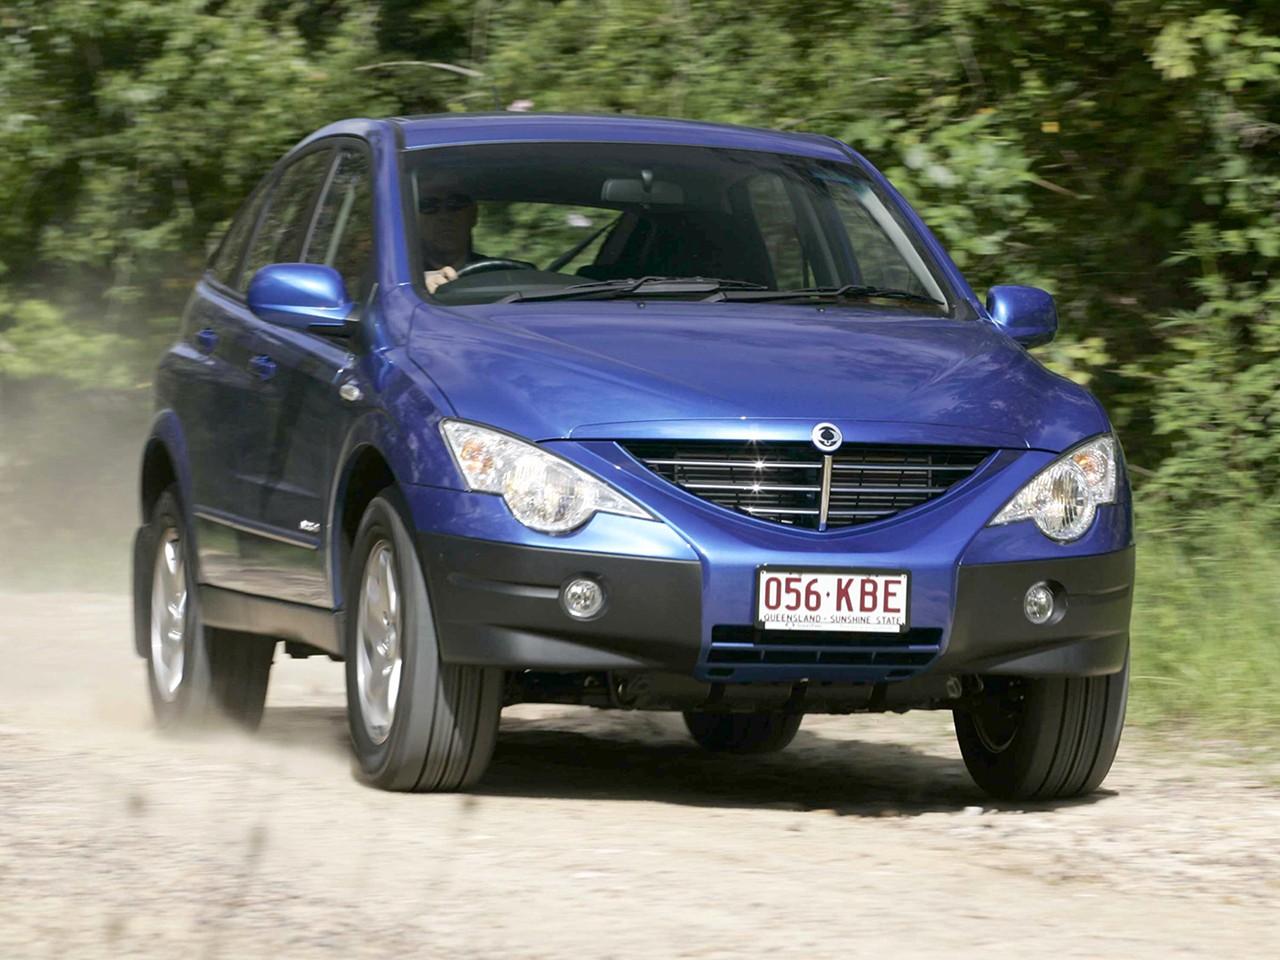 Fuel Efficient Suv >> SSANGYONG Actyon specs & photos - 2006, 2007, 2008, 2009, 2010, 2011 - autoevolution